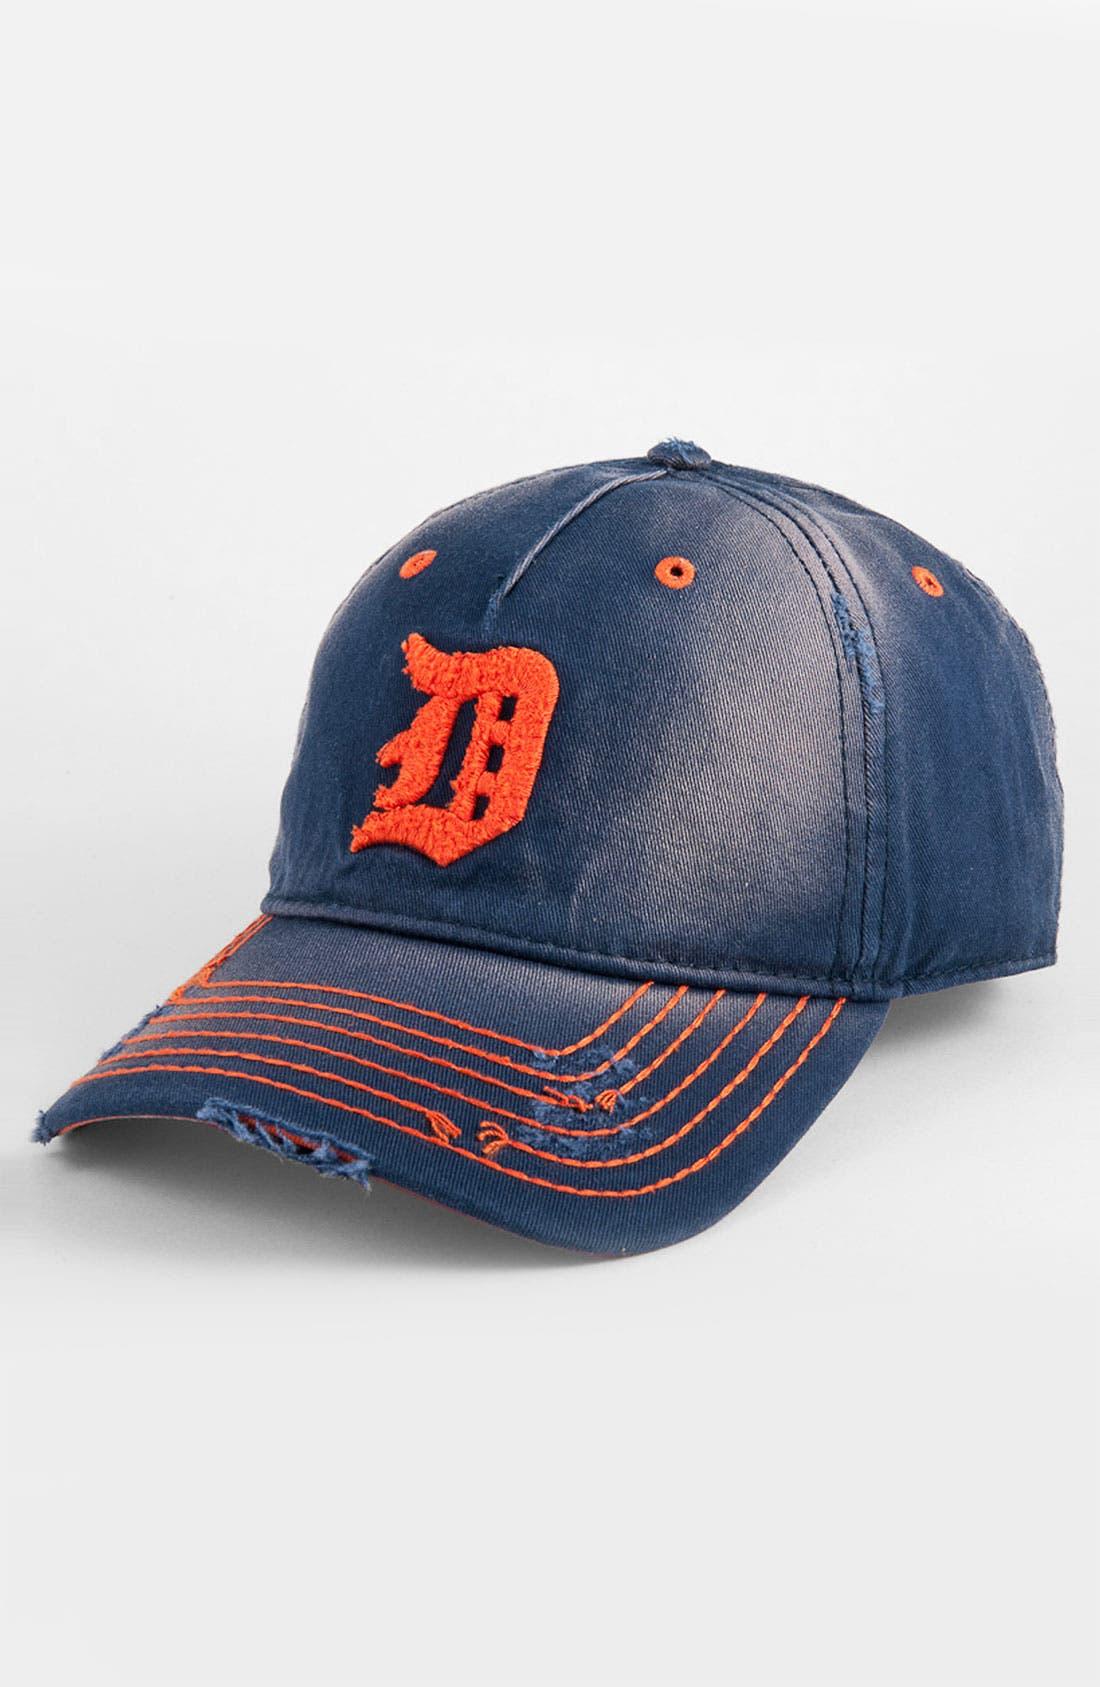 Main Image - American Needle 'Detroit Tigers' Distressed Cap